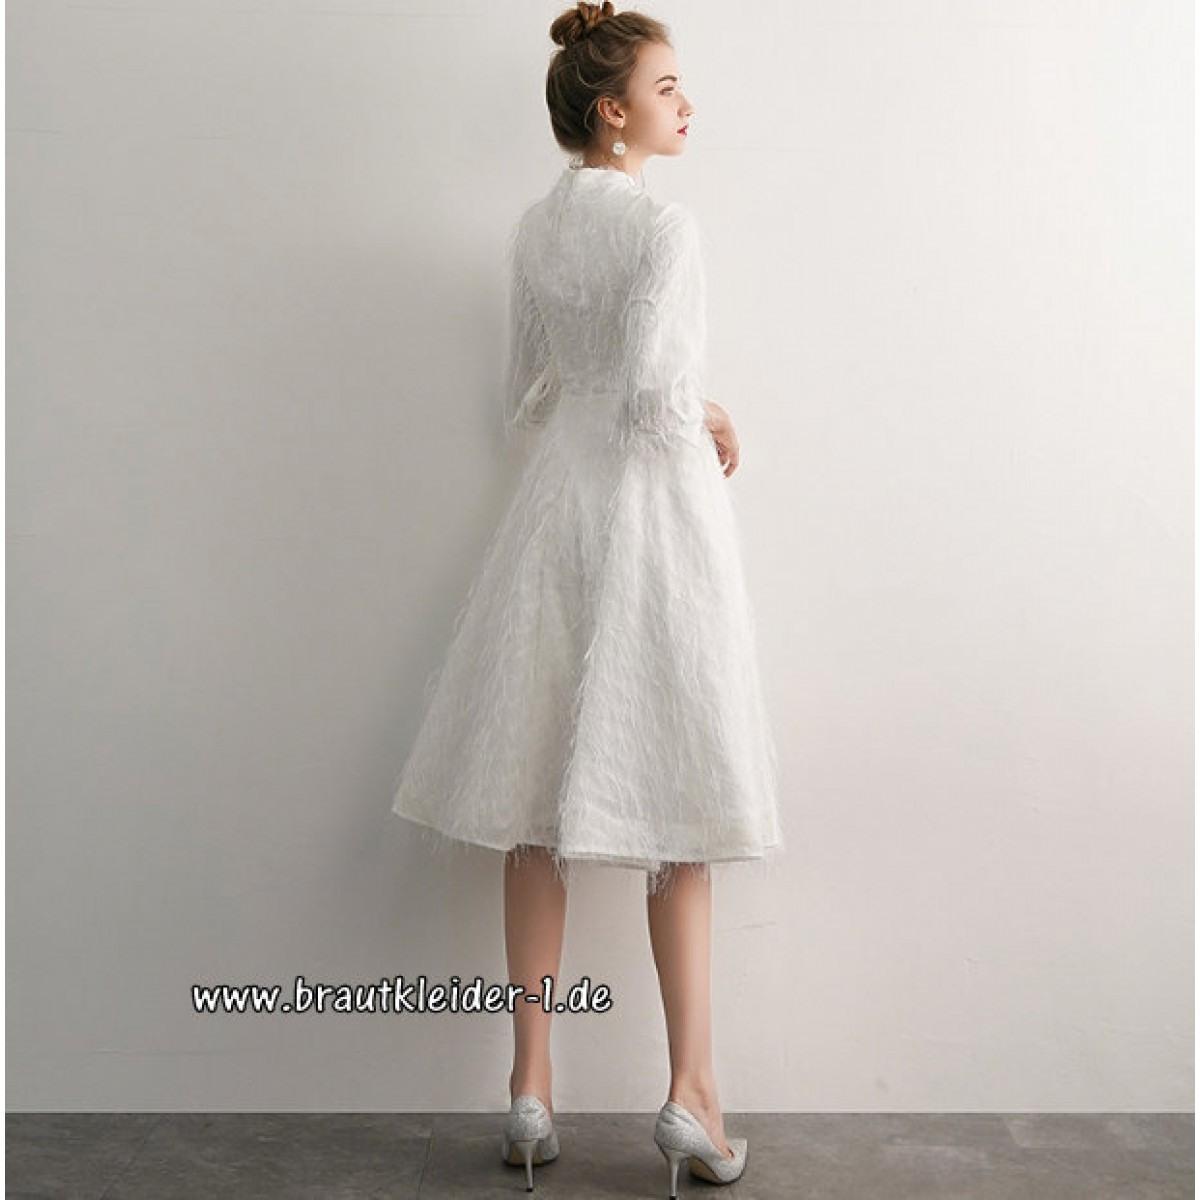 Elegantes A Linie Midi Standesamt Kleid Brautkleid Mit Ärmel